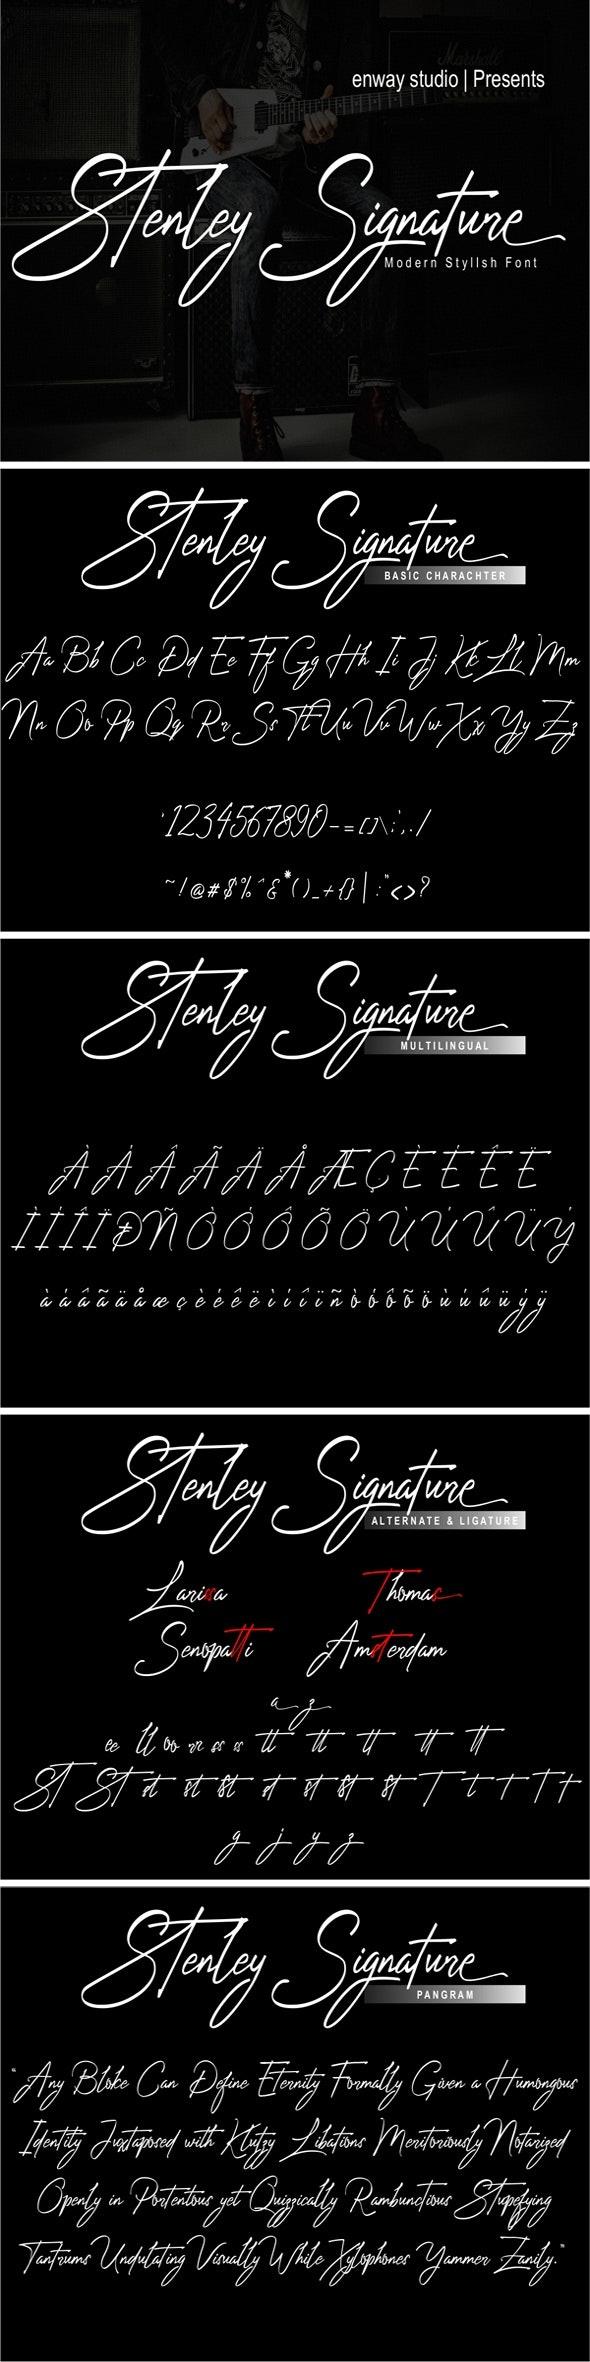 Stenley Signature - Hand-writing Script